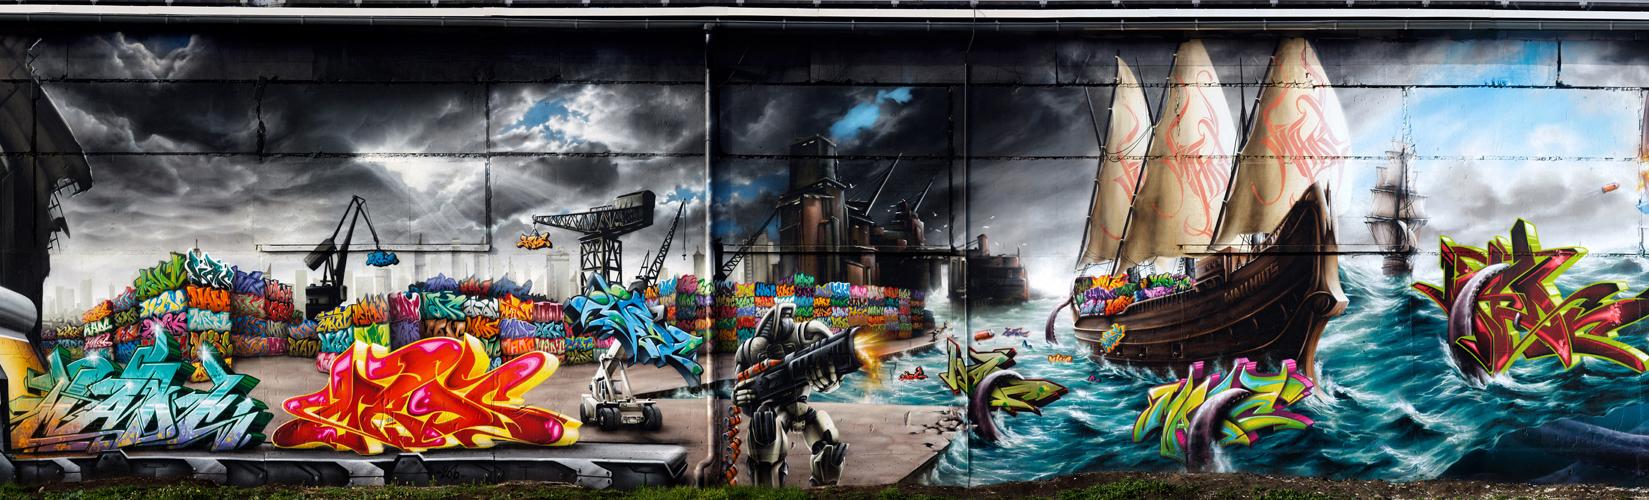 claudia walde madc graffiti 700 wall (2)